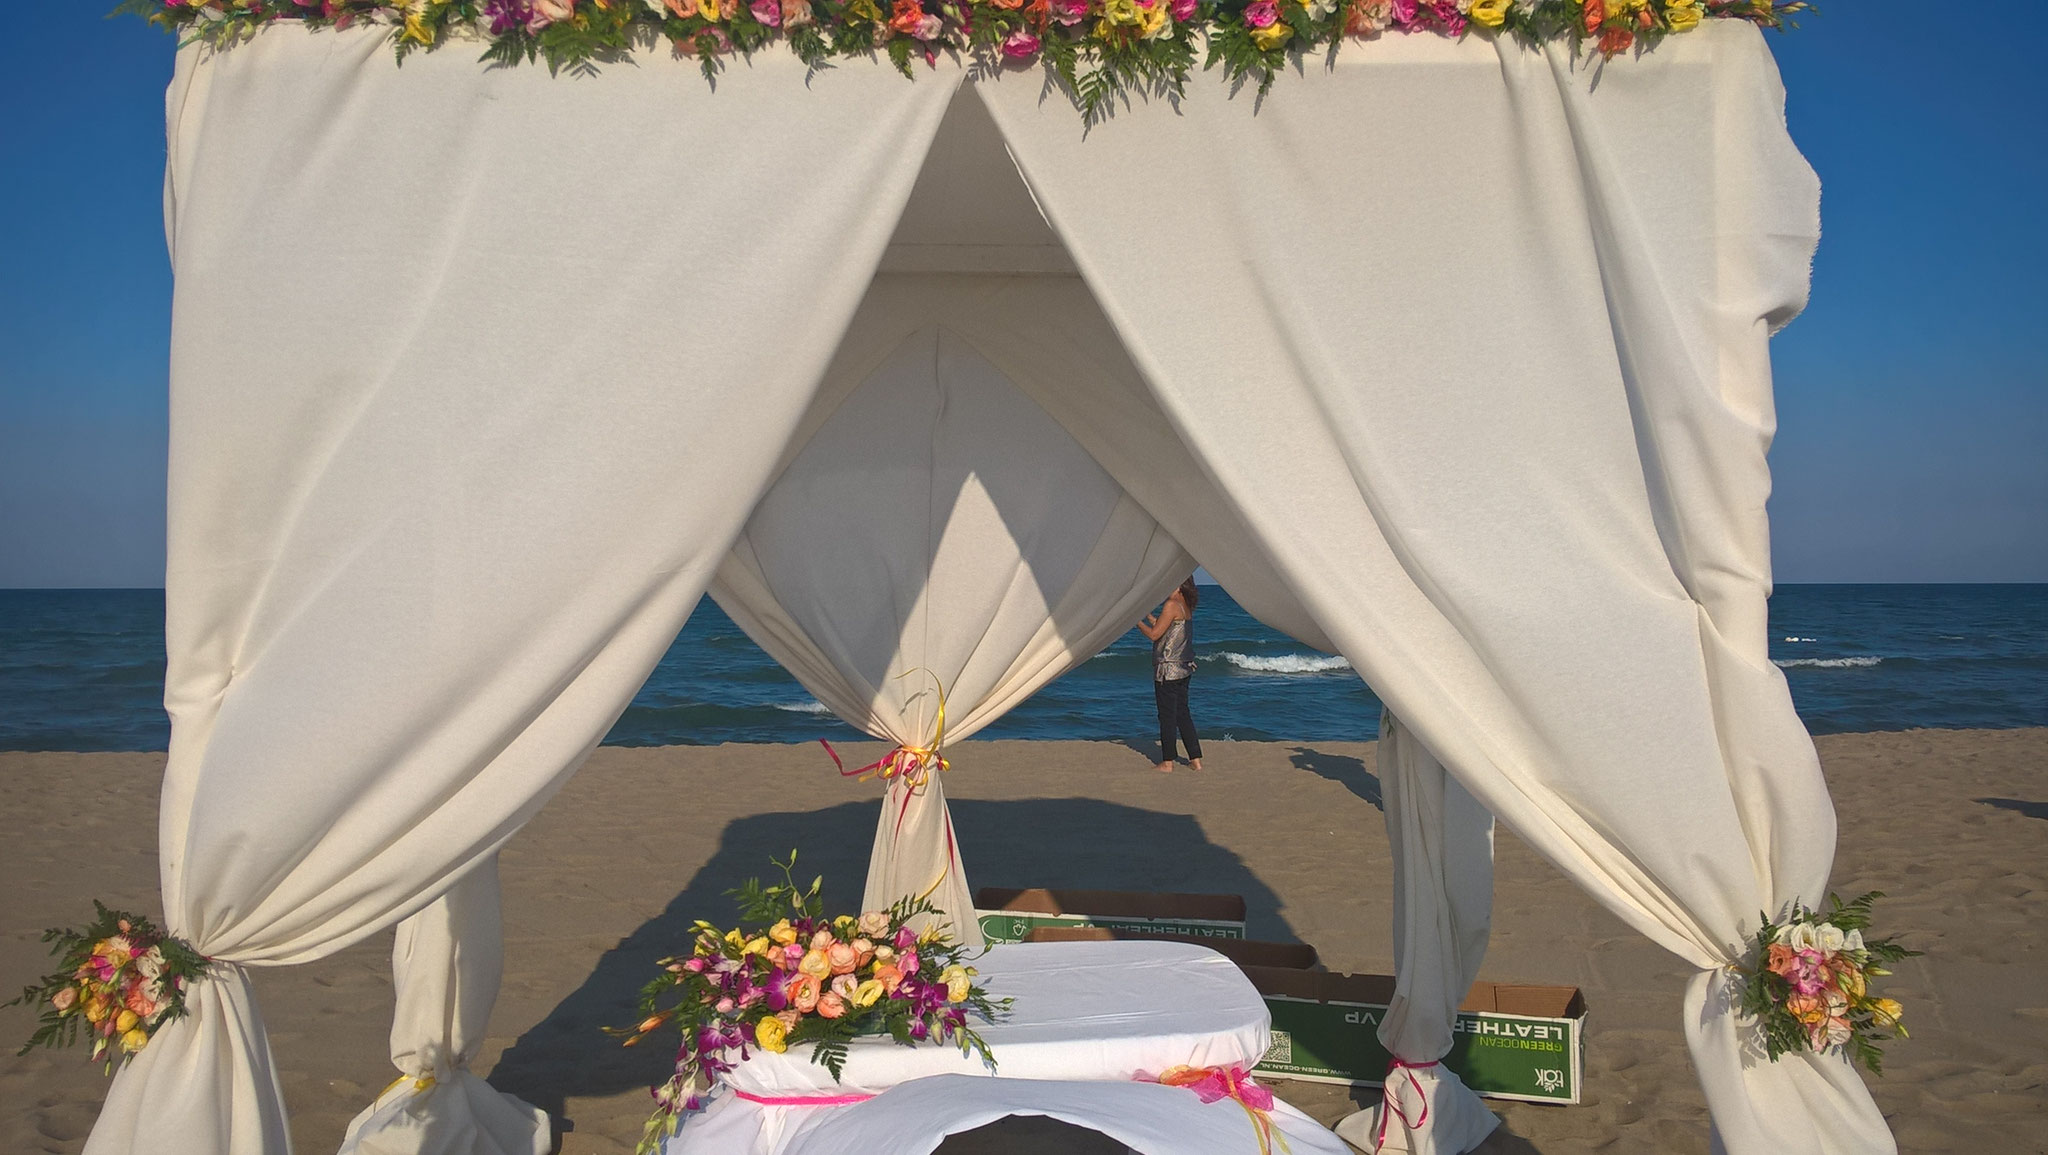 Matrimonio In Spiaggia Sicilia : Matrimonio in spiaggia sicilia beach wedding roxana